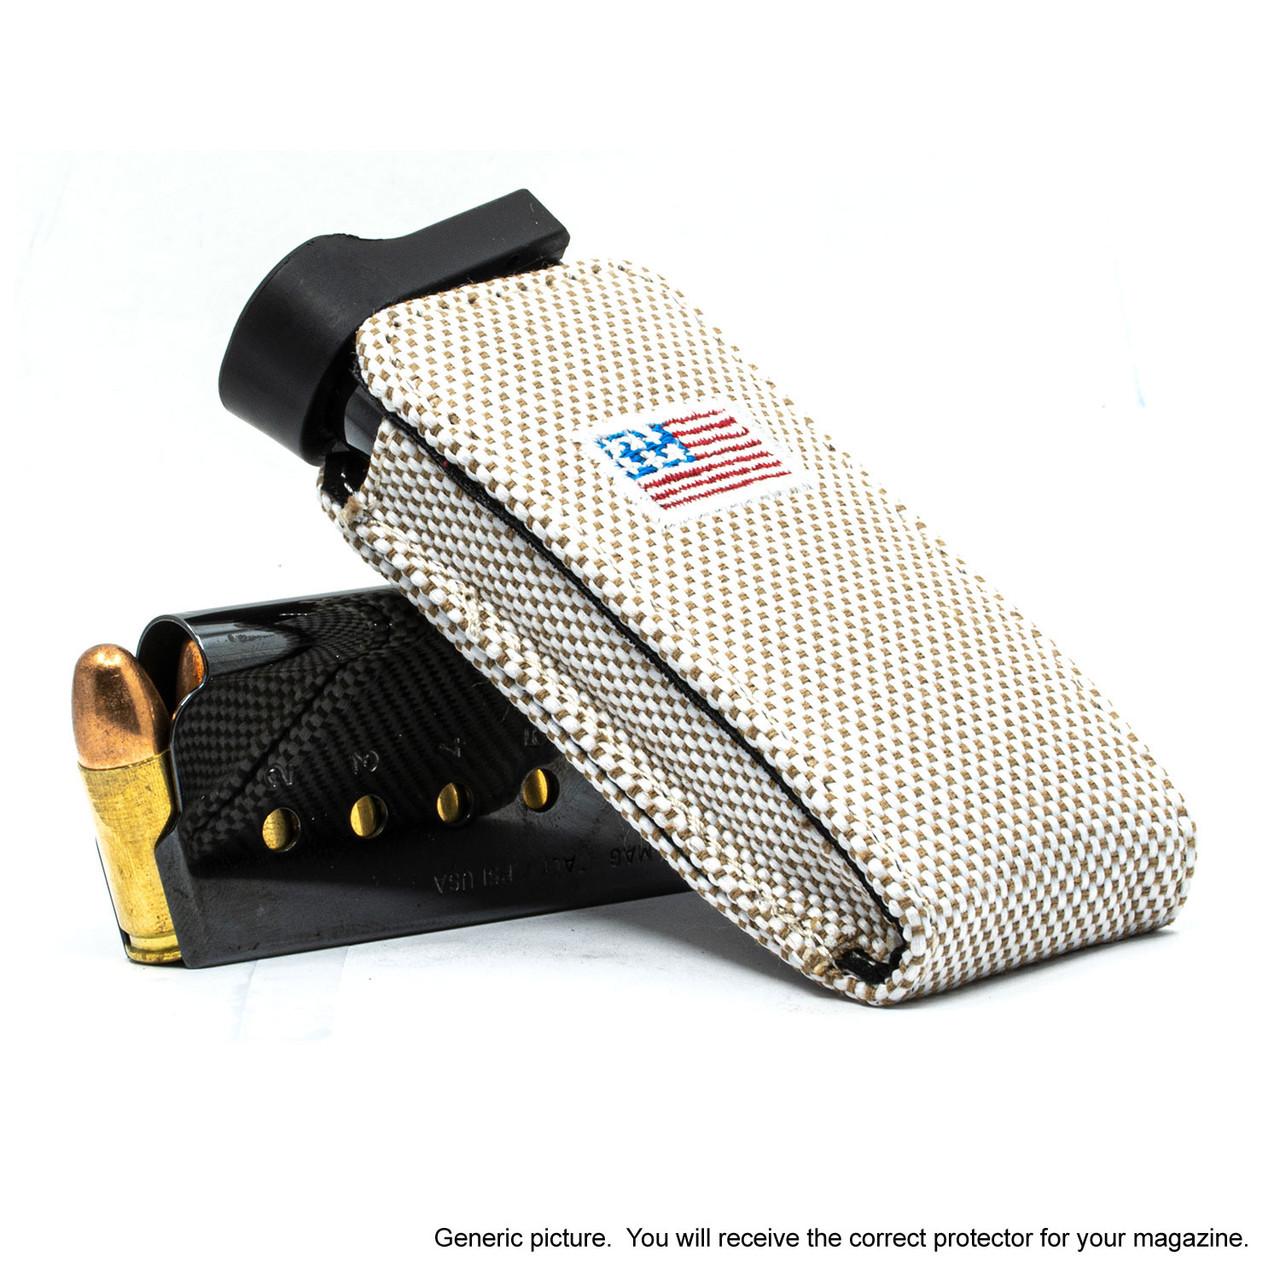 HK VP40 Tan Canvas Flag Magazine Pocket Protector